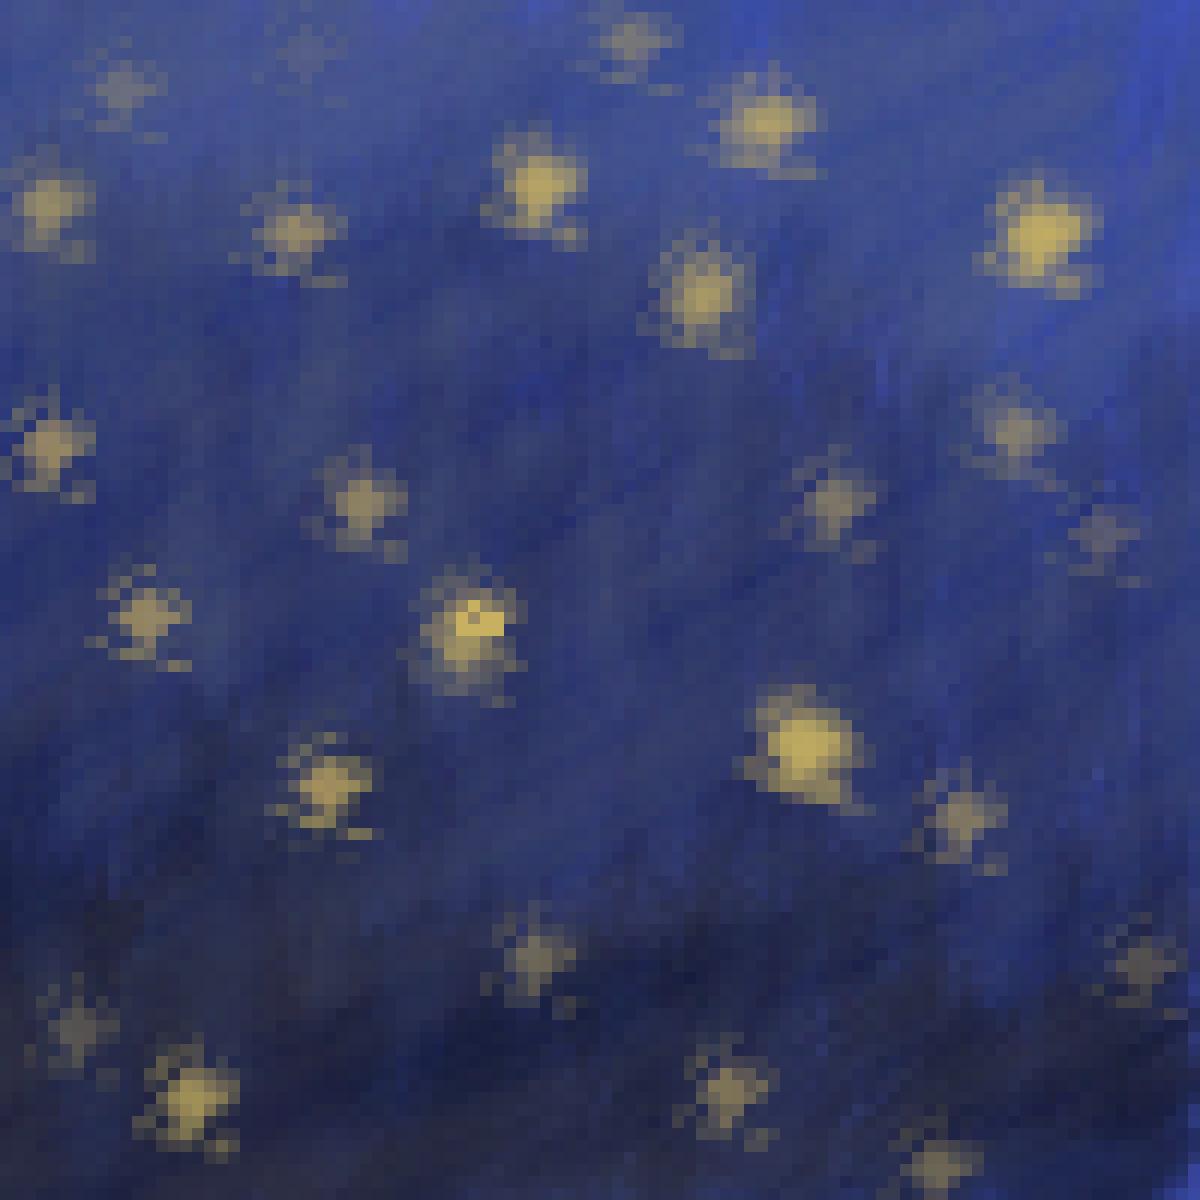 Night Sky by TheFuzzyDucky